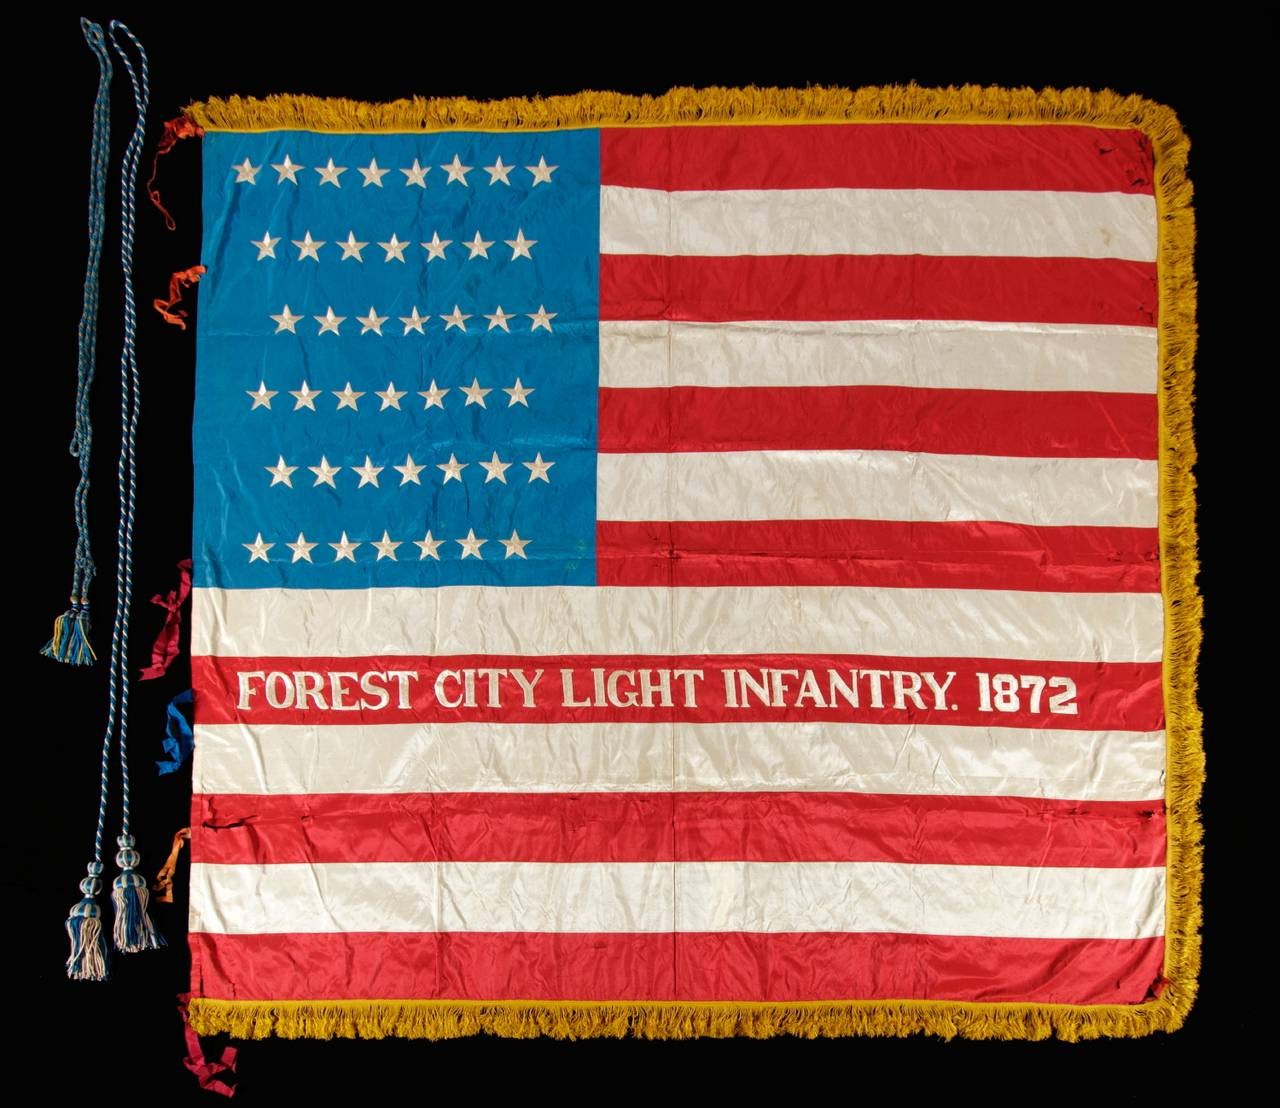 43 Star, Idaho Statehood, American Flag image 2